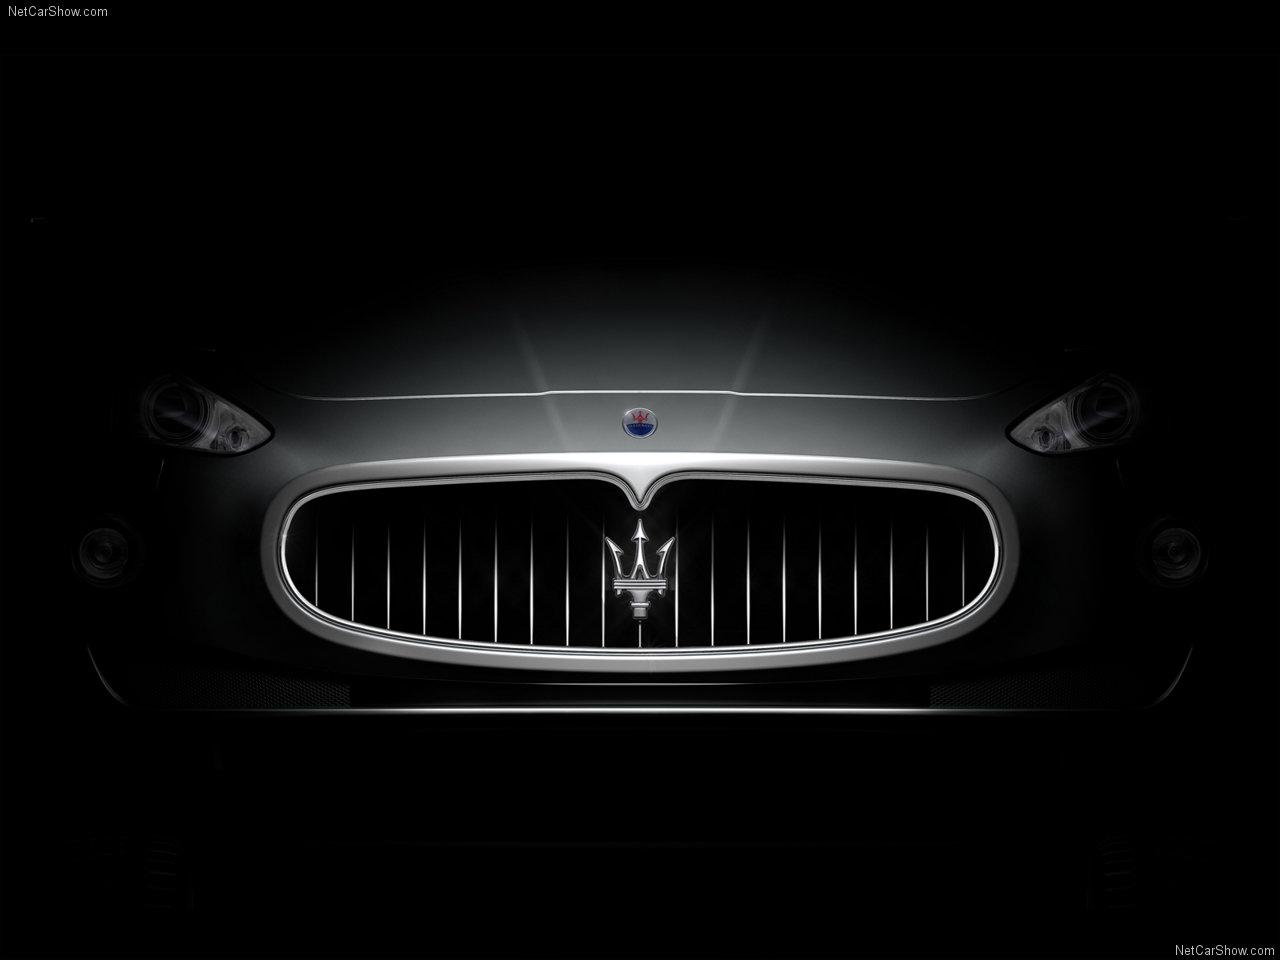 Maserati Logo in Grill Wallpaper HD Desktop 1280x960